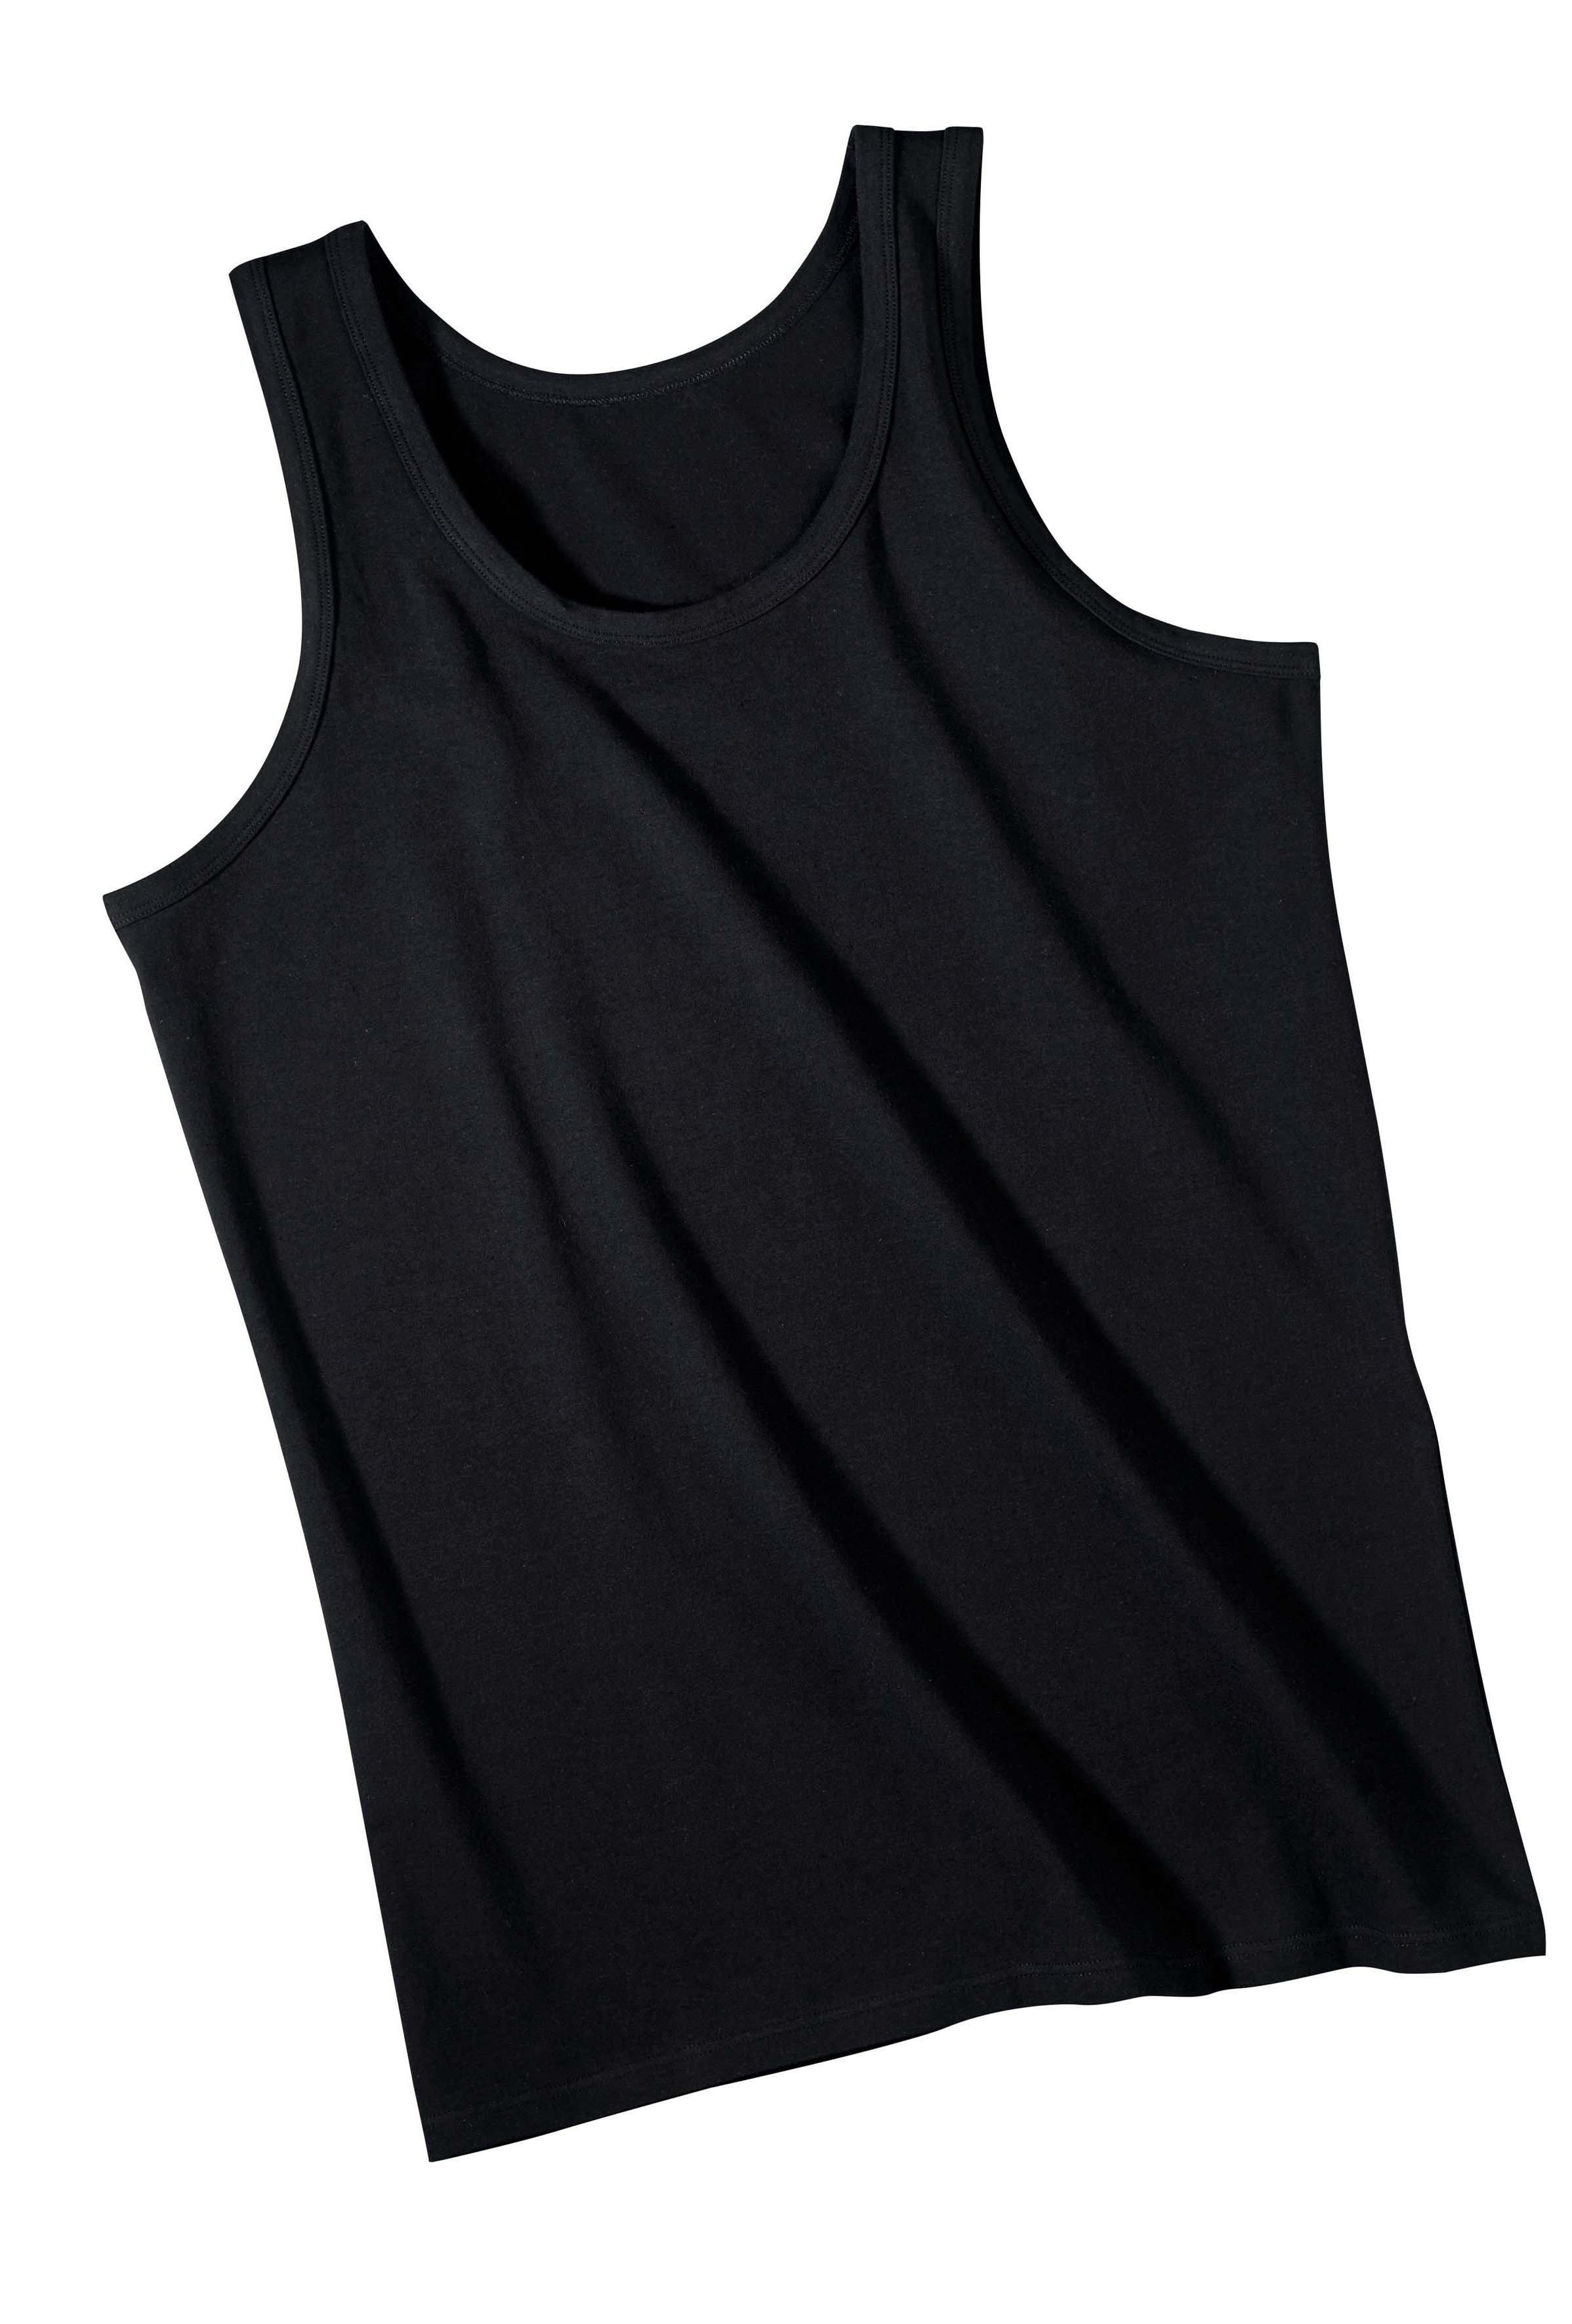 H-SM-Shirt,tinta u.S-3pz.nero